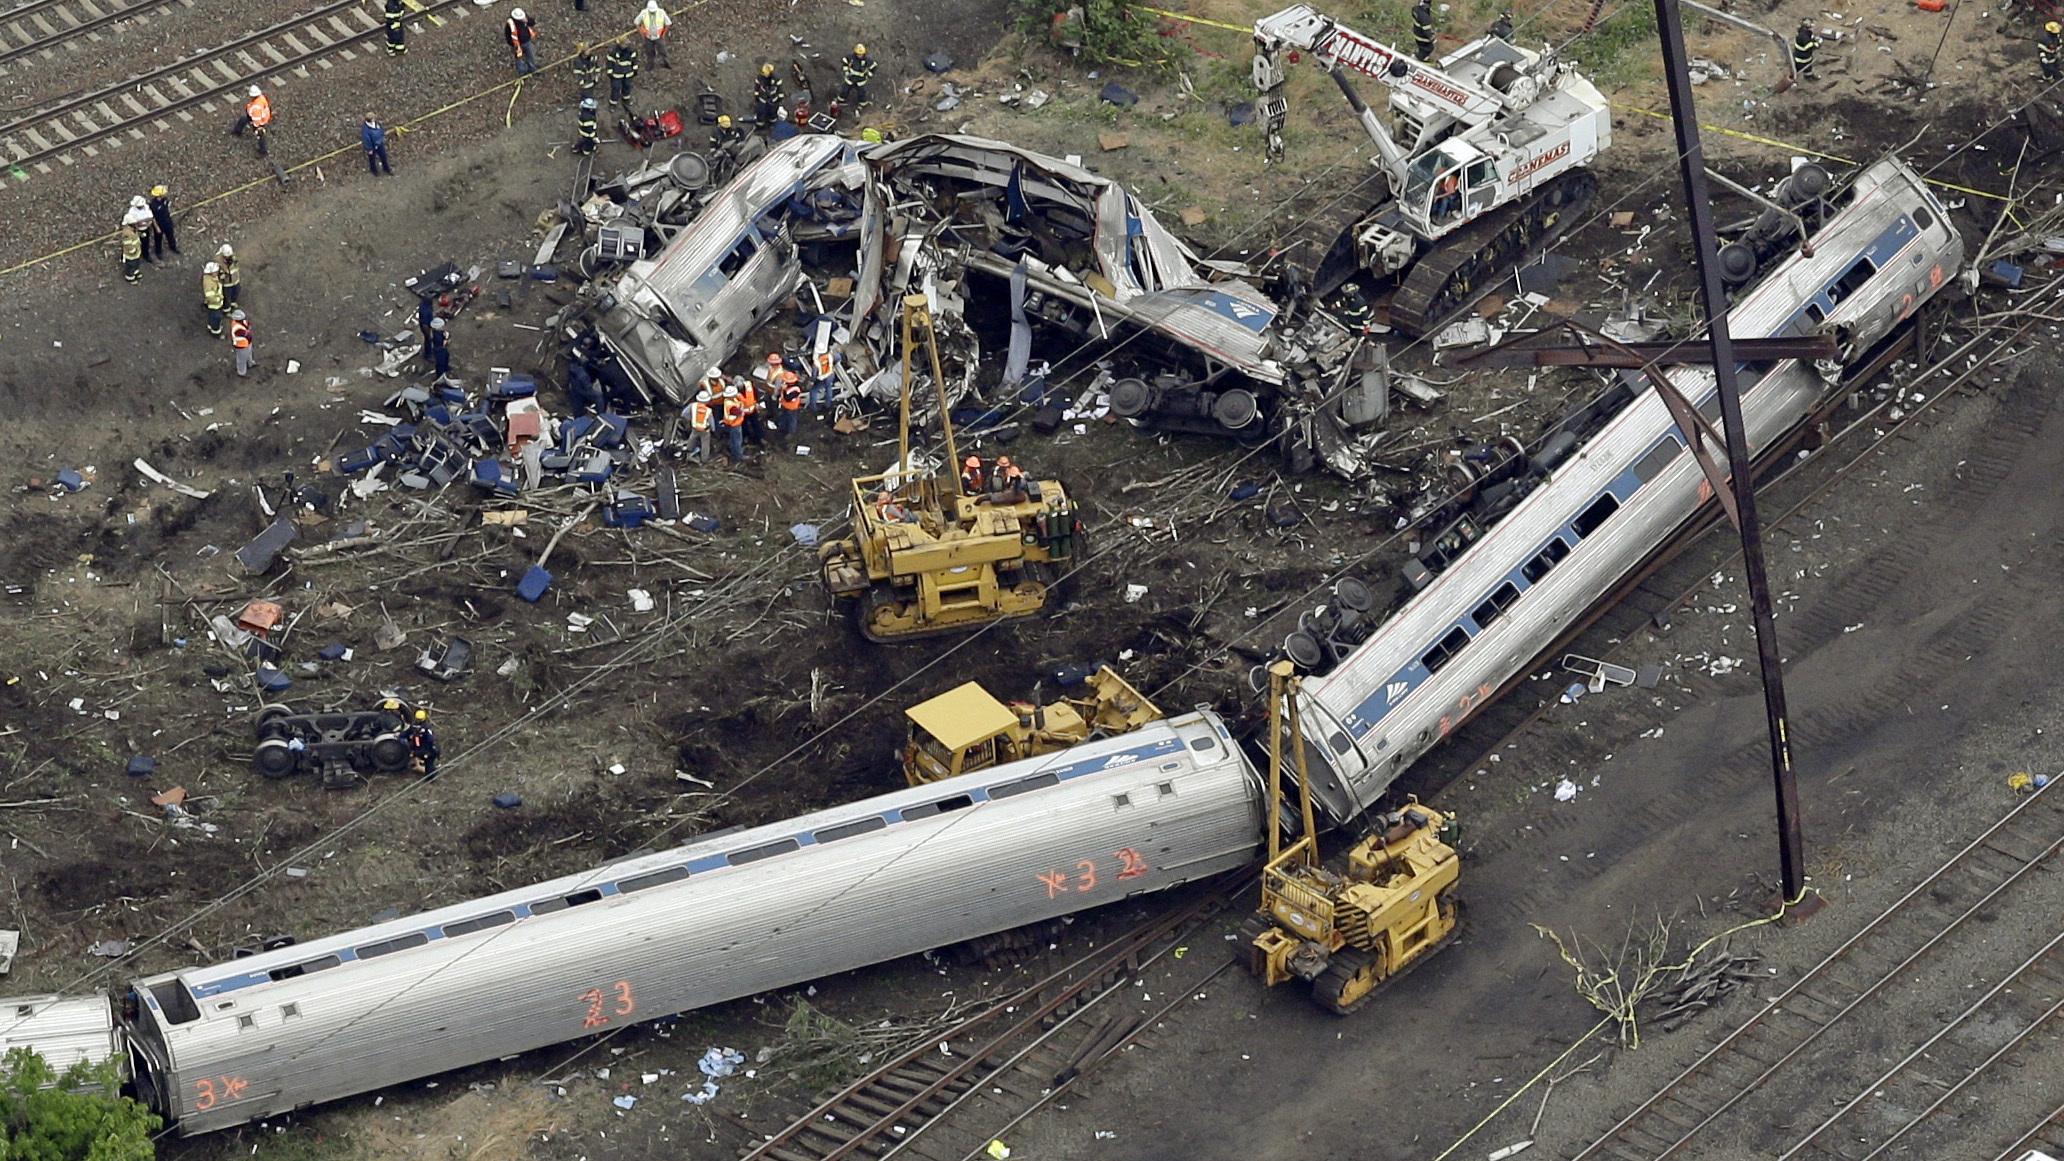 Overruling DA's Office, Judge Calls for Amtrak Driver's Arrest